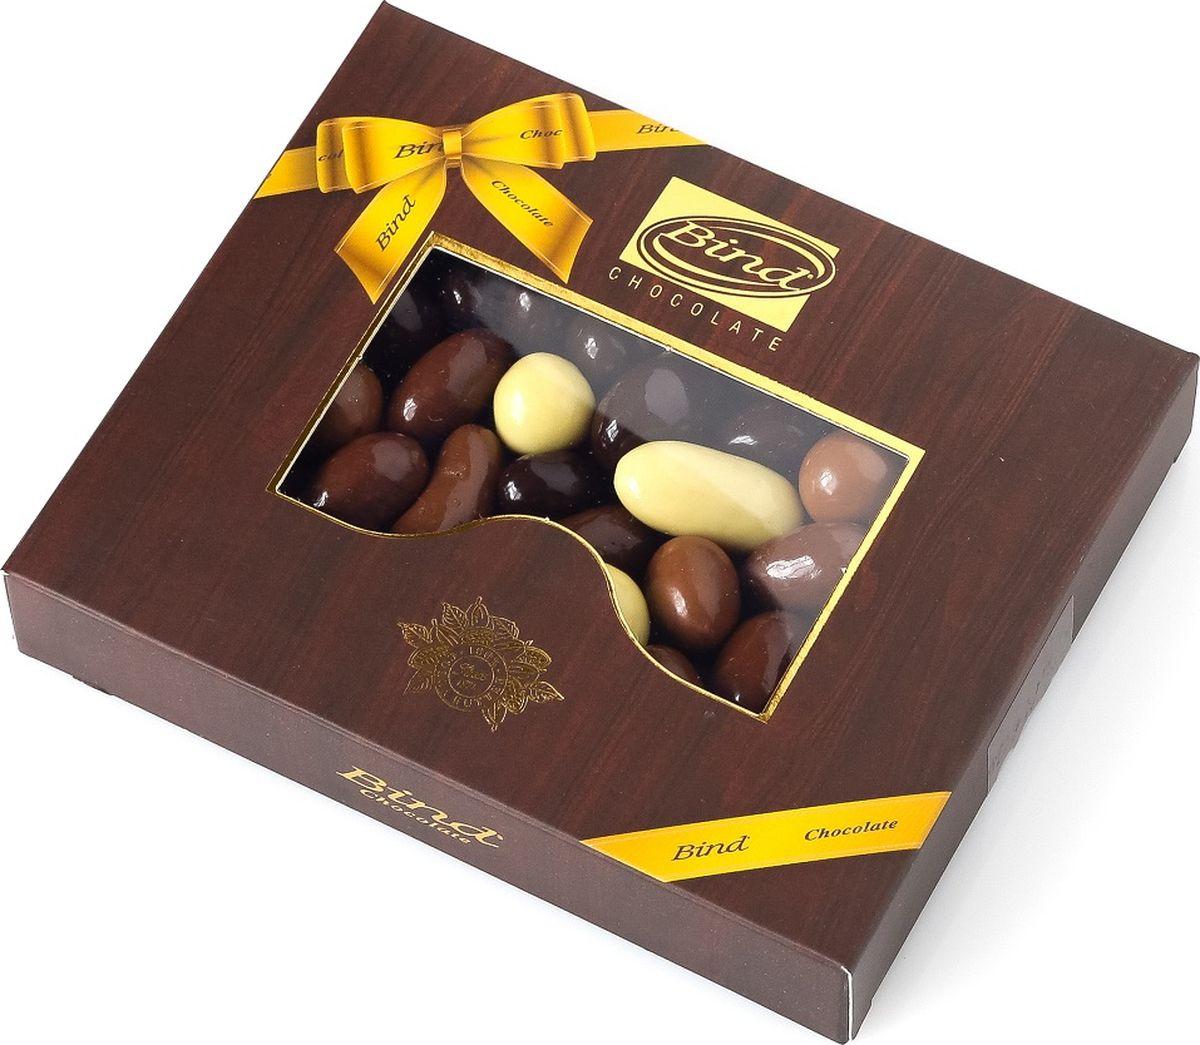 Bind микс из разного шоколада с орехами и цукатами драже, 100 г кто быстрее две игрушки с цукатами 5 г